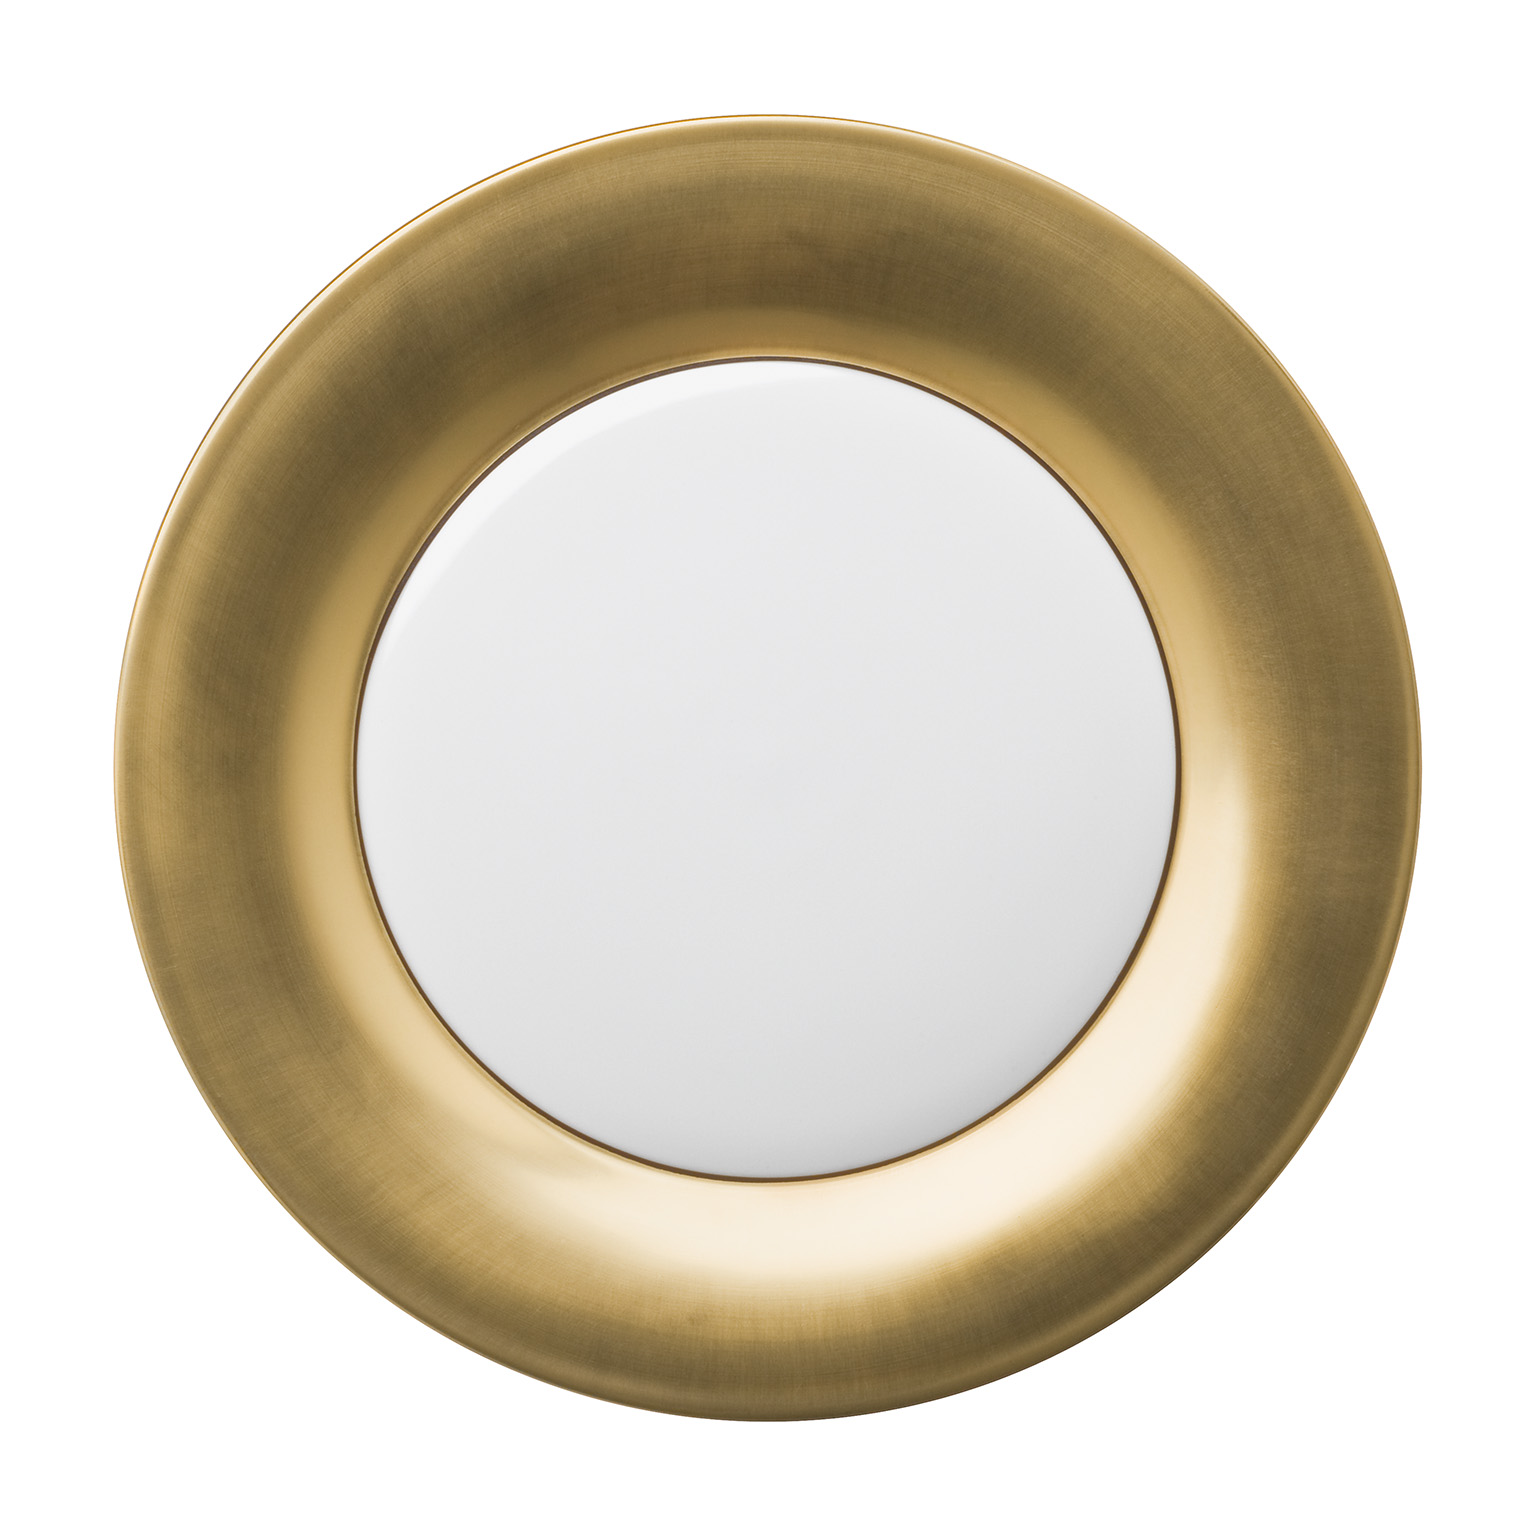 Polite Gold Presentation Plate